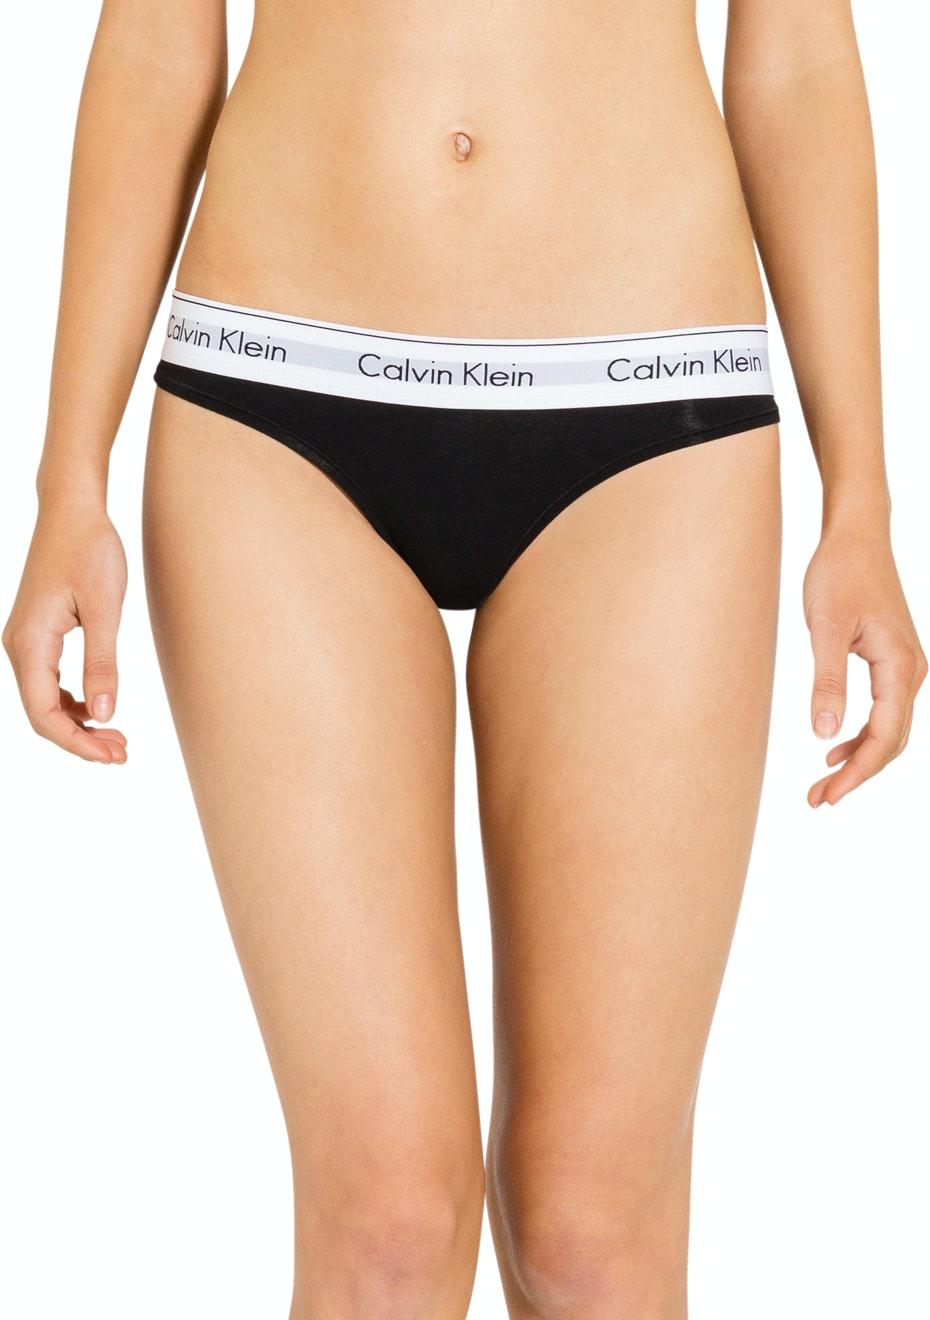 Calvin Klein - Modern Cotton, Thong - Black